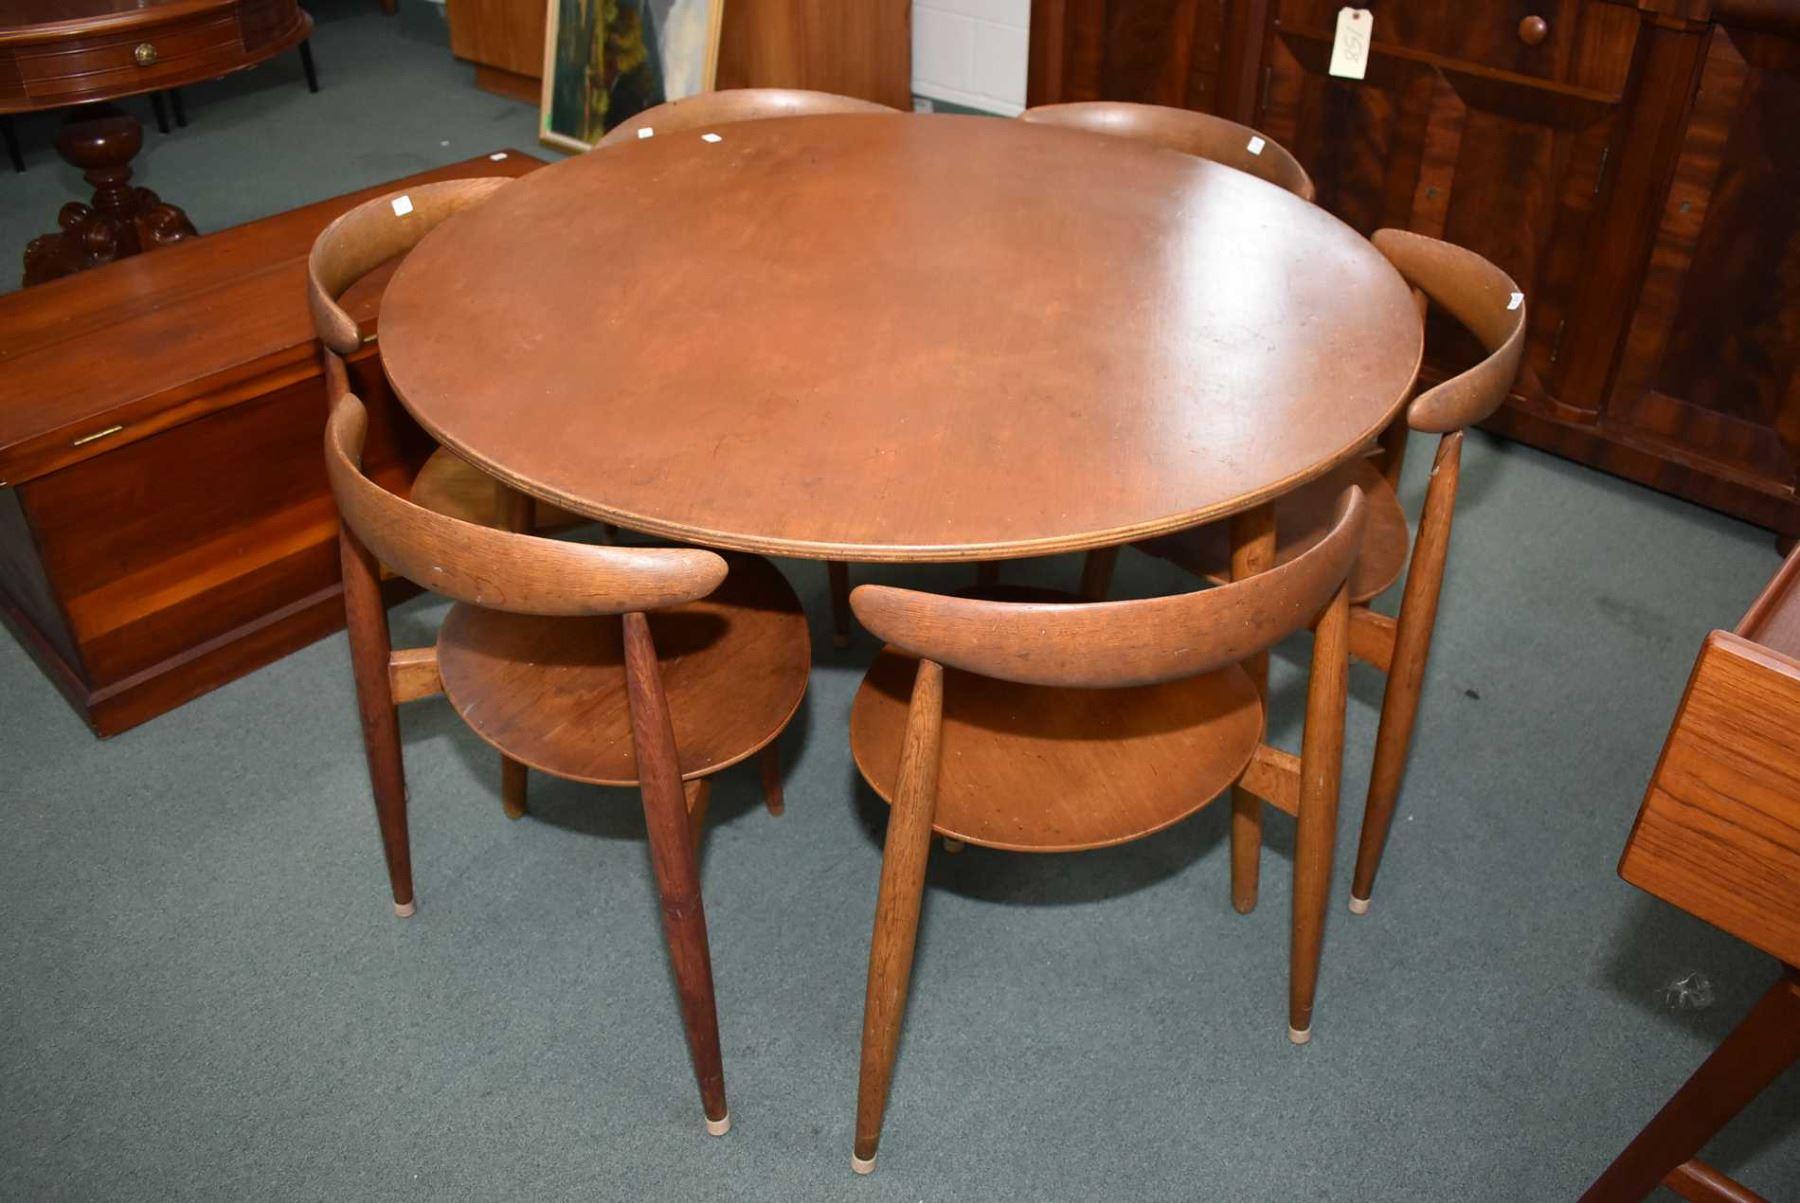 Mid century modern round dining table with six, three legged ...